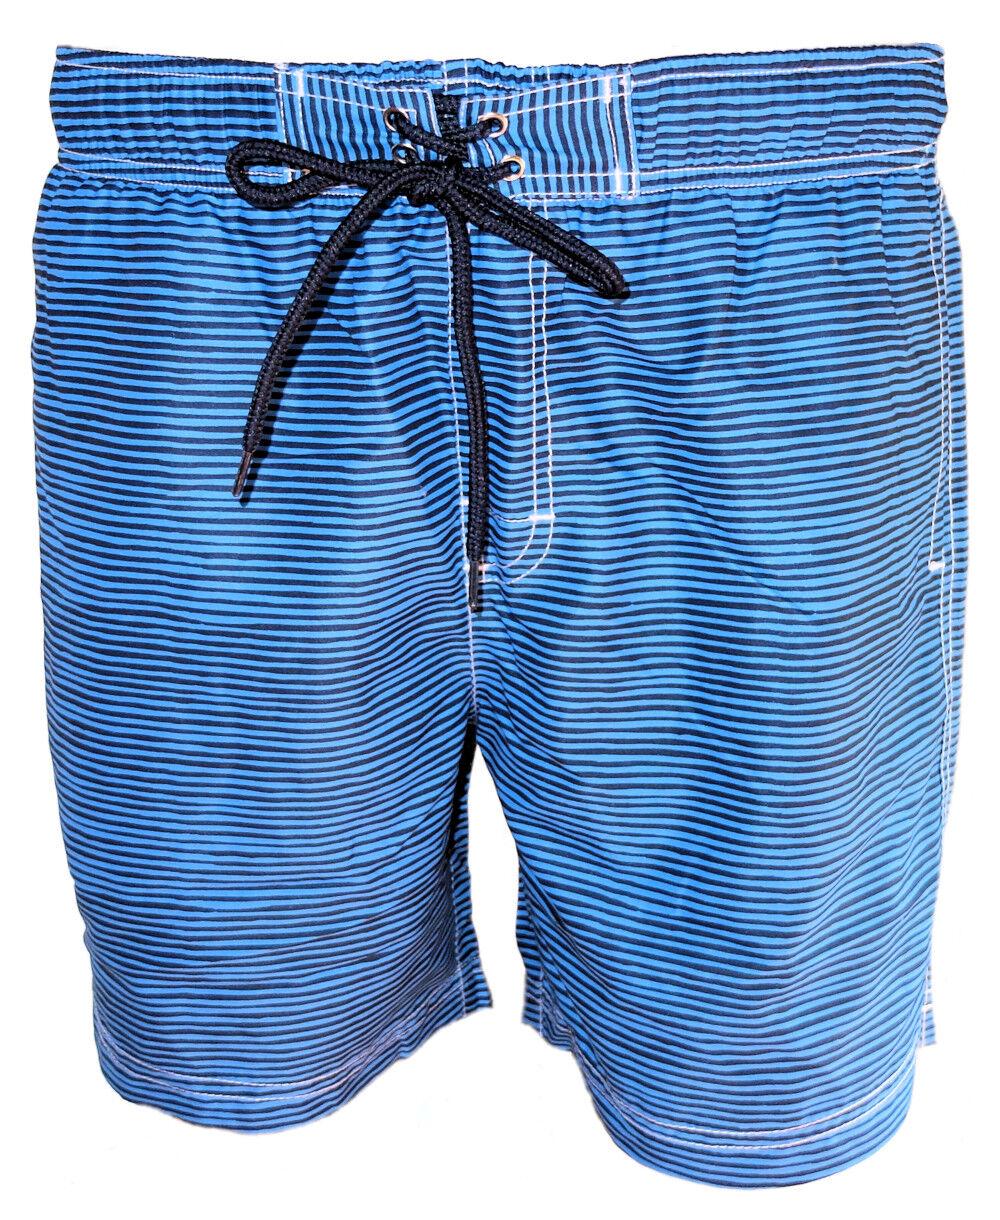 Baileys Freizeit Swim Short Beach royalblue dunkelblue Streifendessin Gr. M-4XL